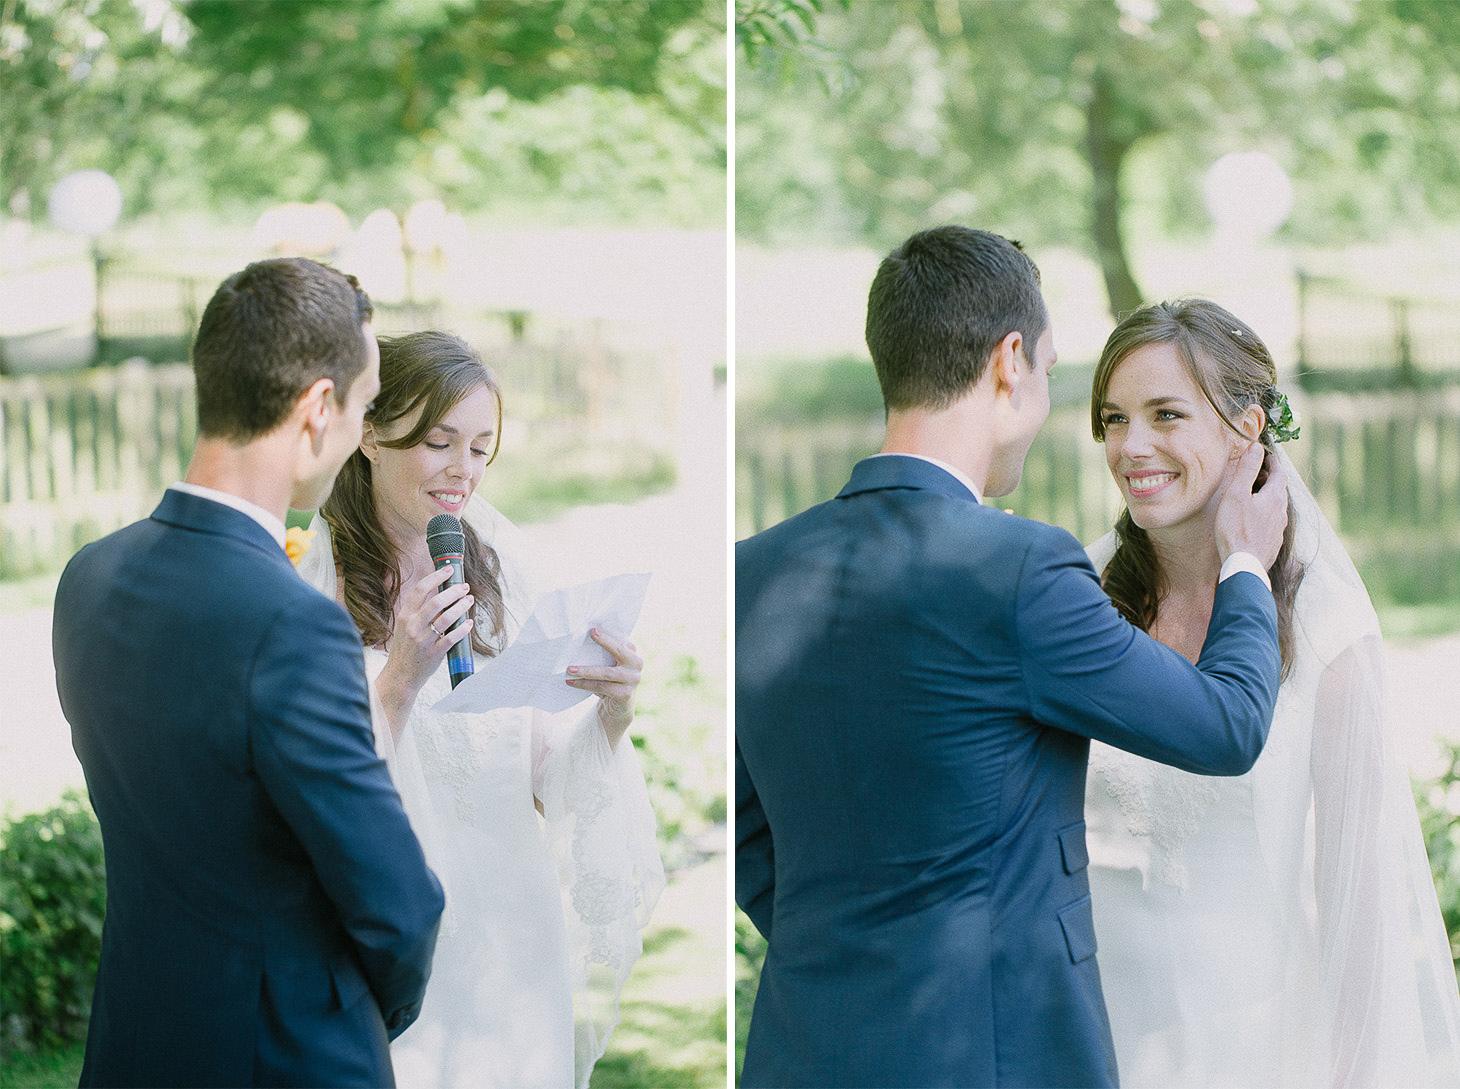 photographe-mariage-champ-de-launay-normandie-00036